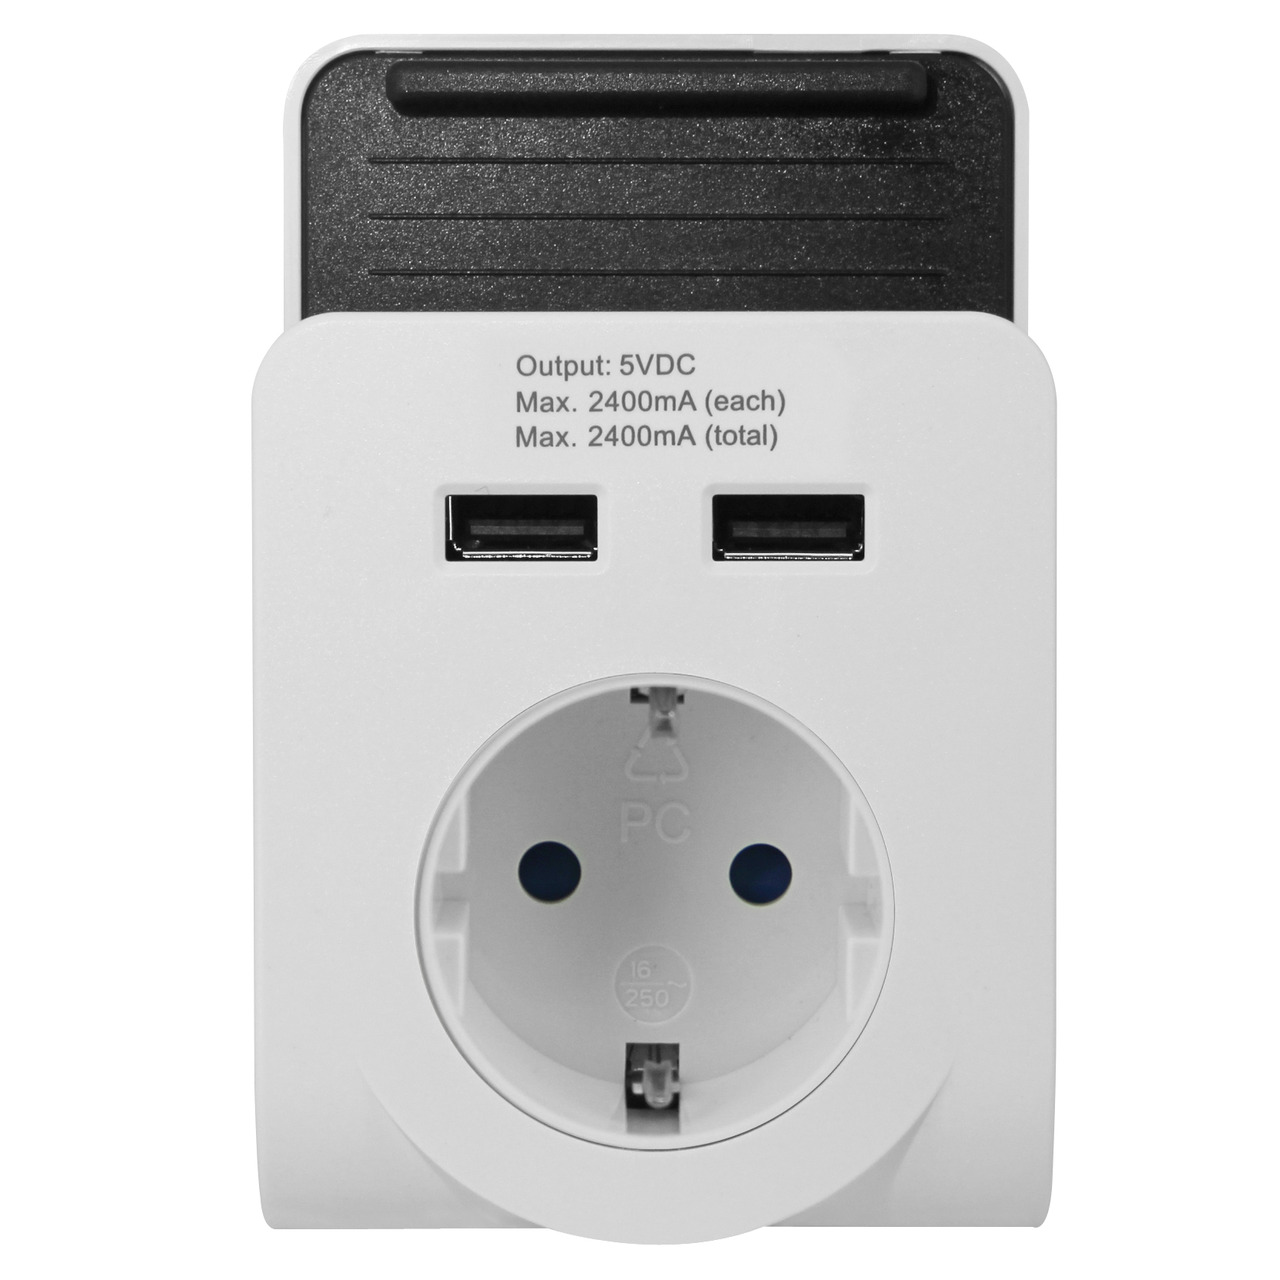 EverFlourish USB-Steckdosenadapter mit Smartphone-Halterung- 2x USB- 2-4 A